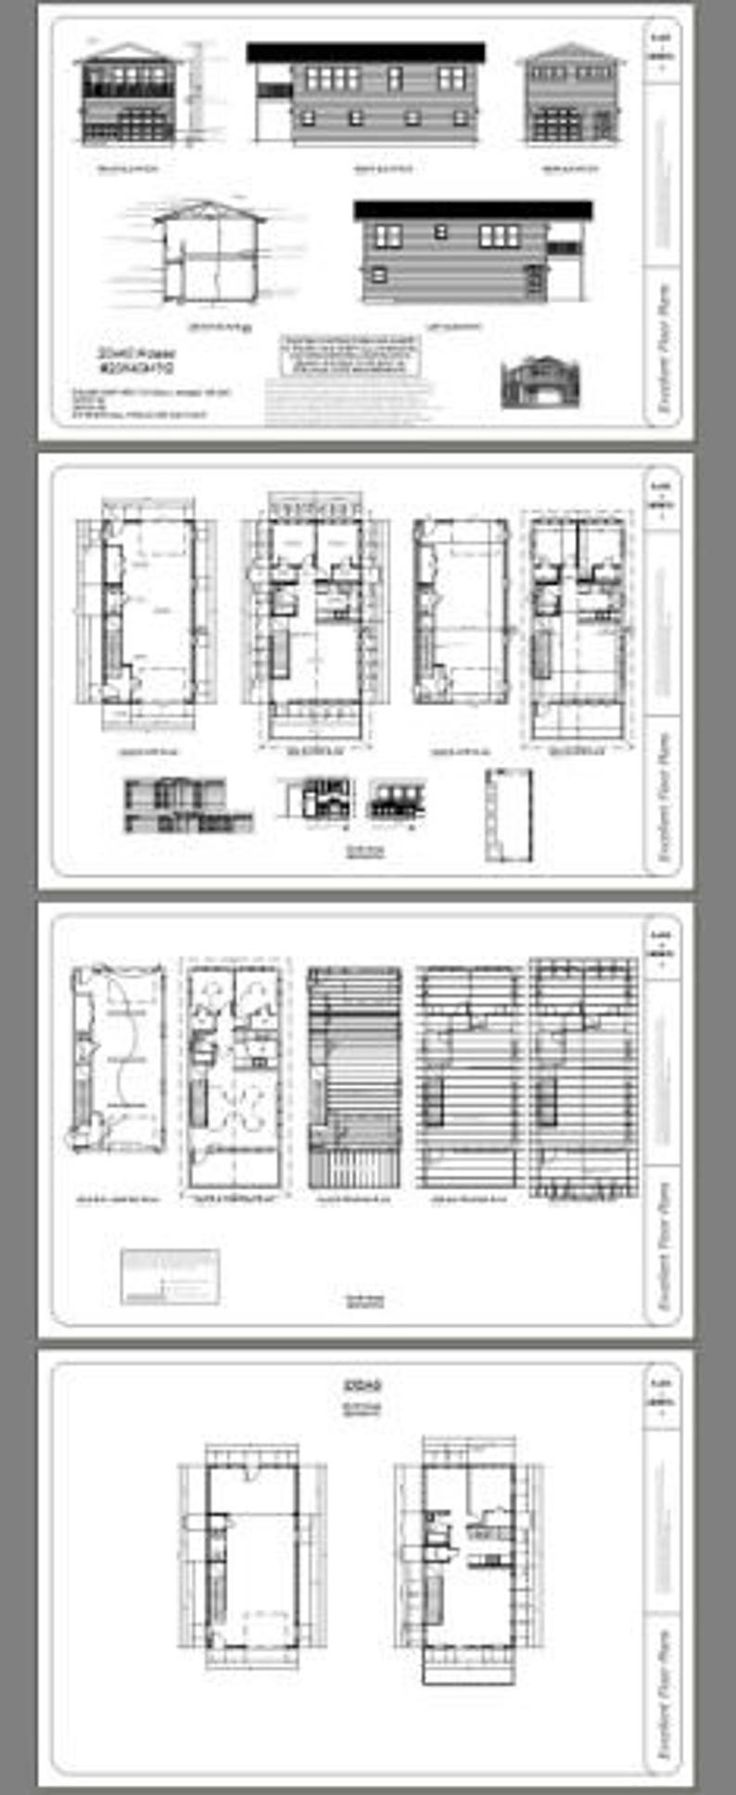 20x40 House 2Bedroom 1.5Bath 859 sq ft PDF